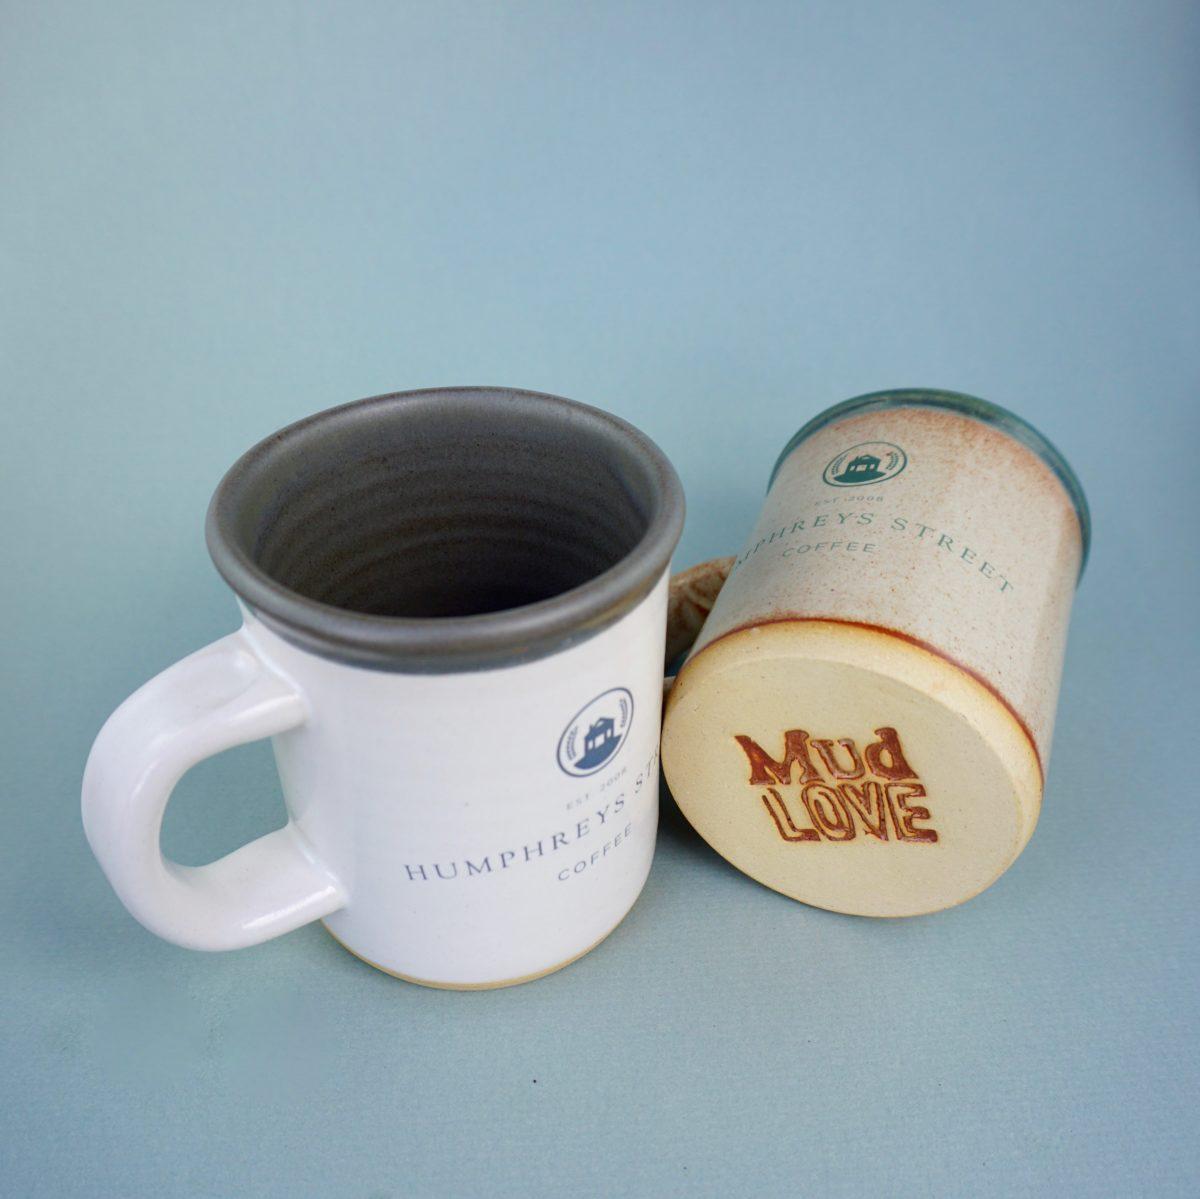 Humphreys Street mugs mud love